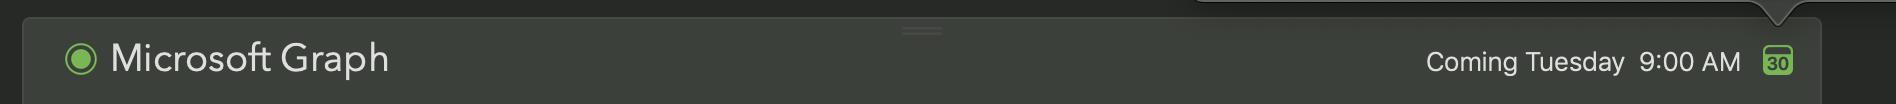 Screenshot%20of%20Agenda%20(4-24-19%2C%205-58-08%20AM)